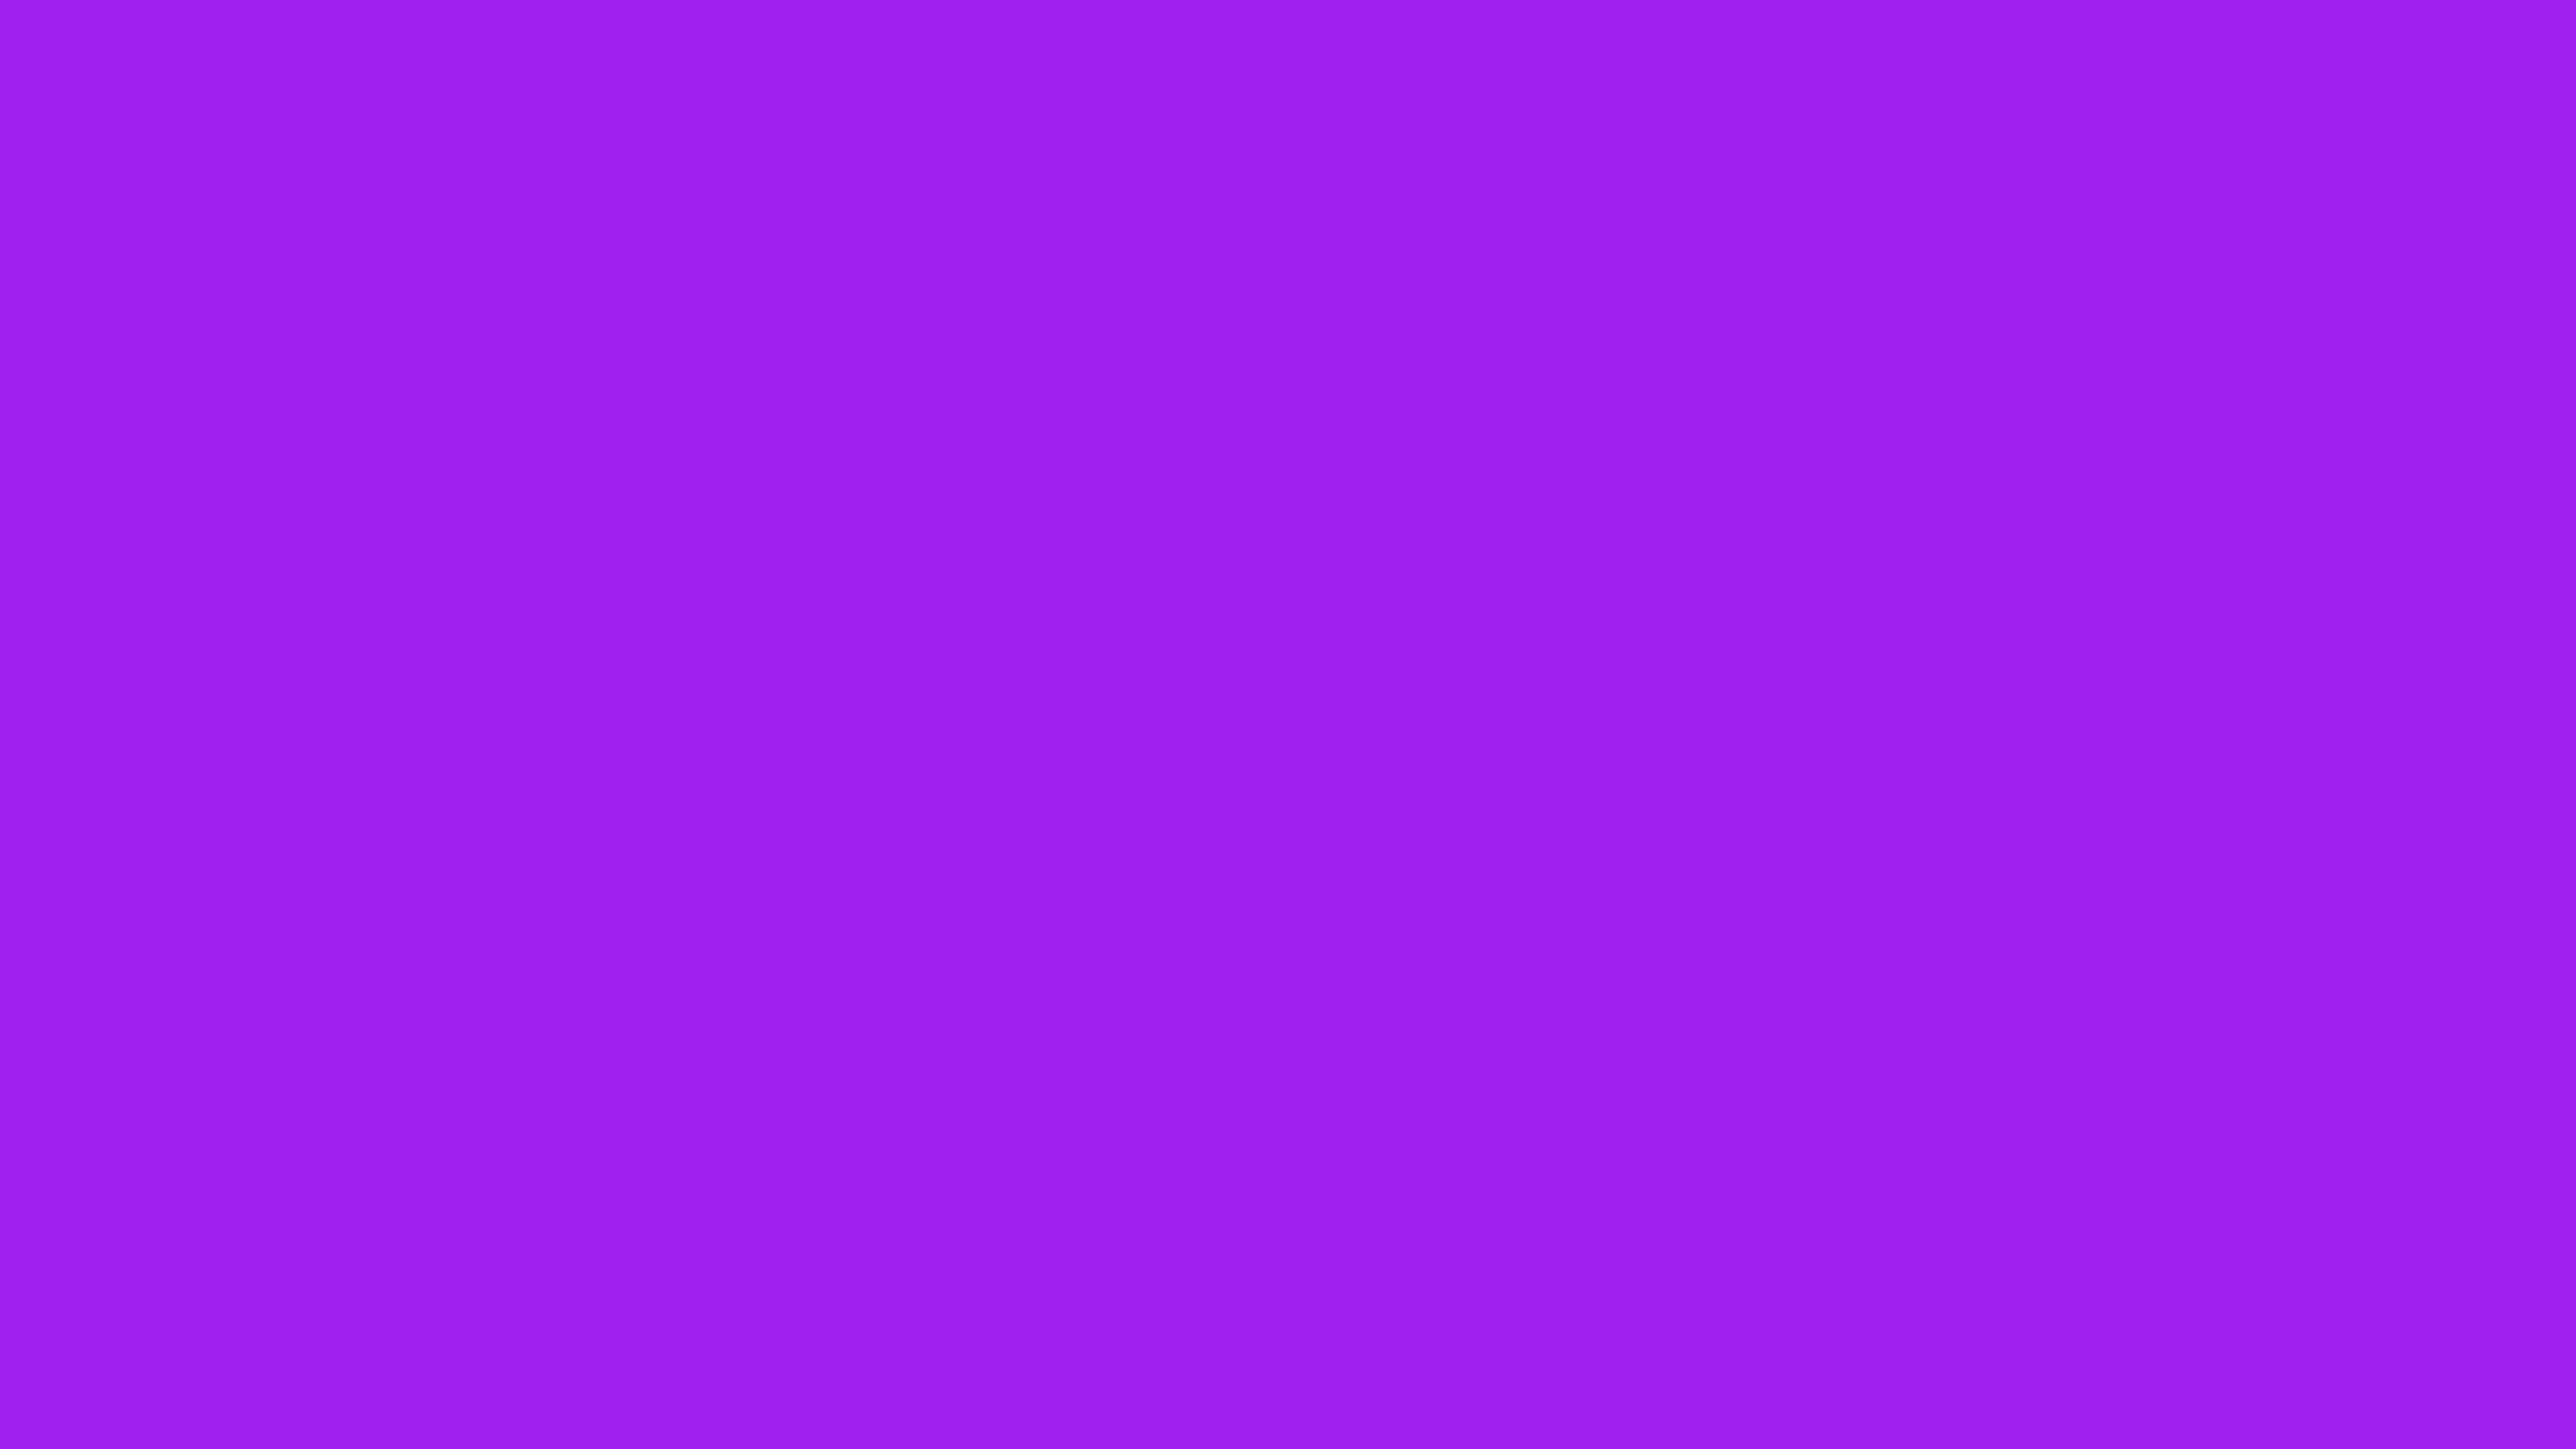 3840x2160 Purple X11 Gui Solid Color Background